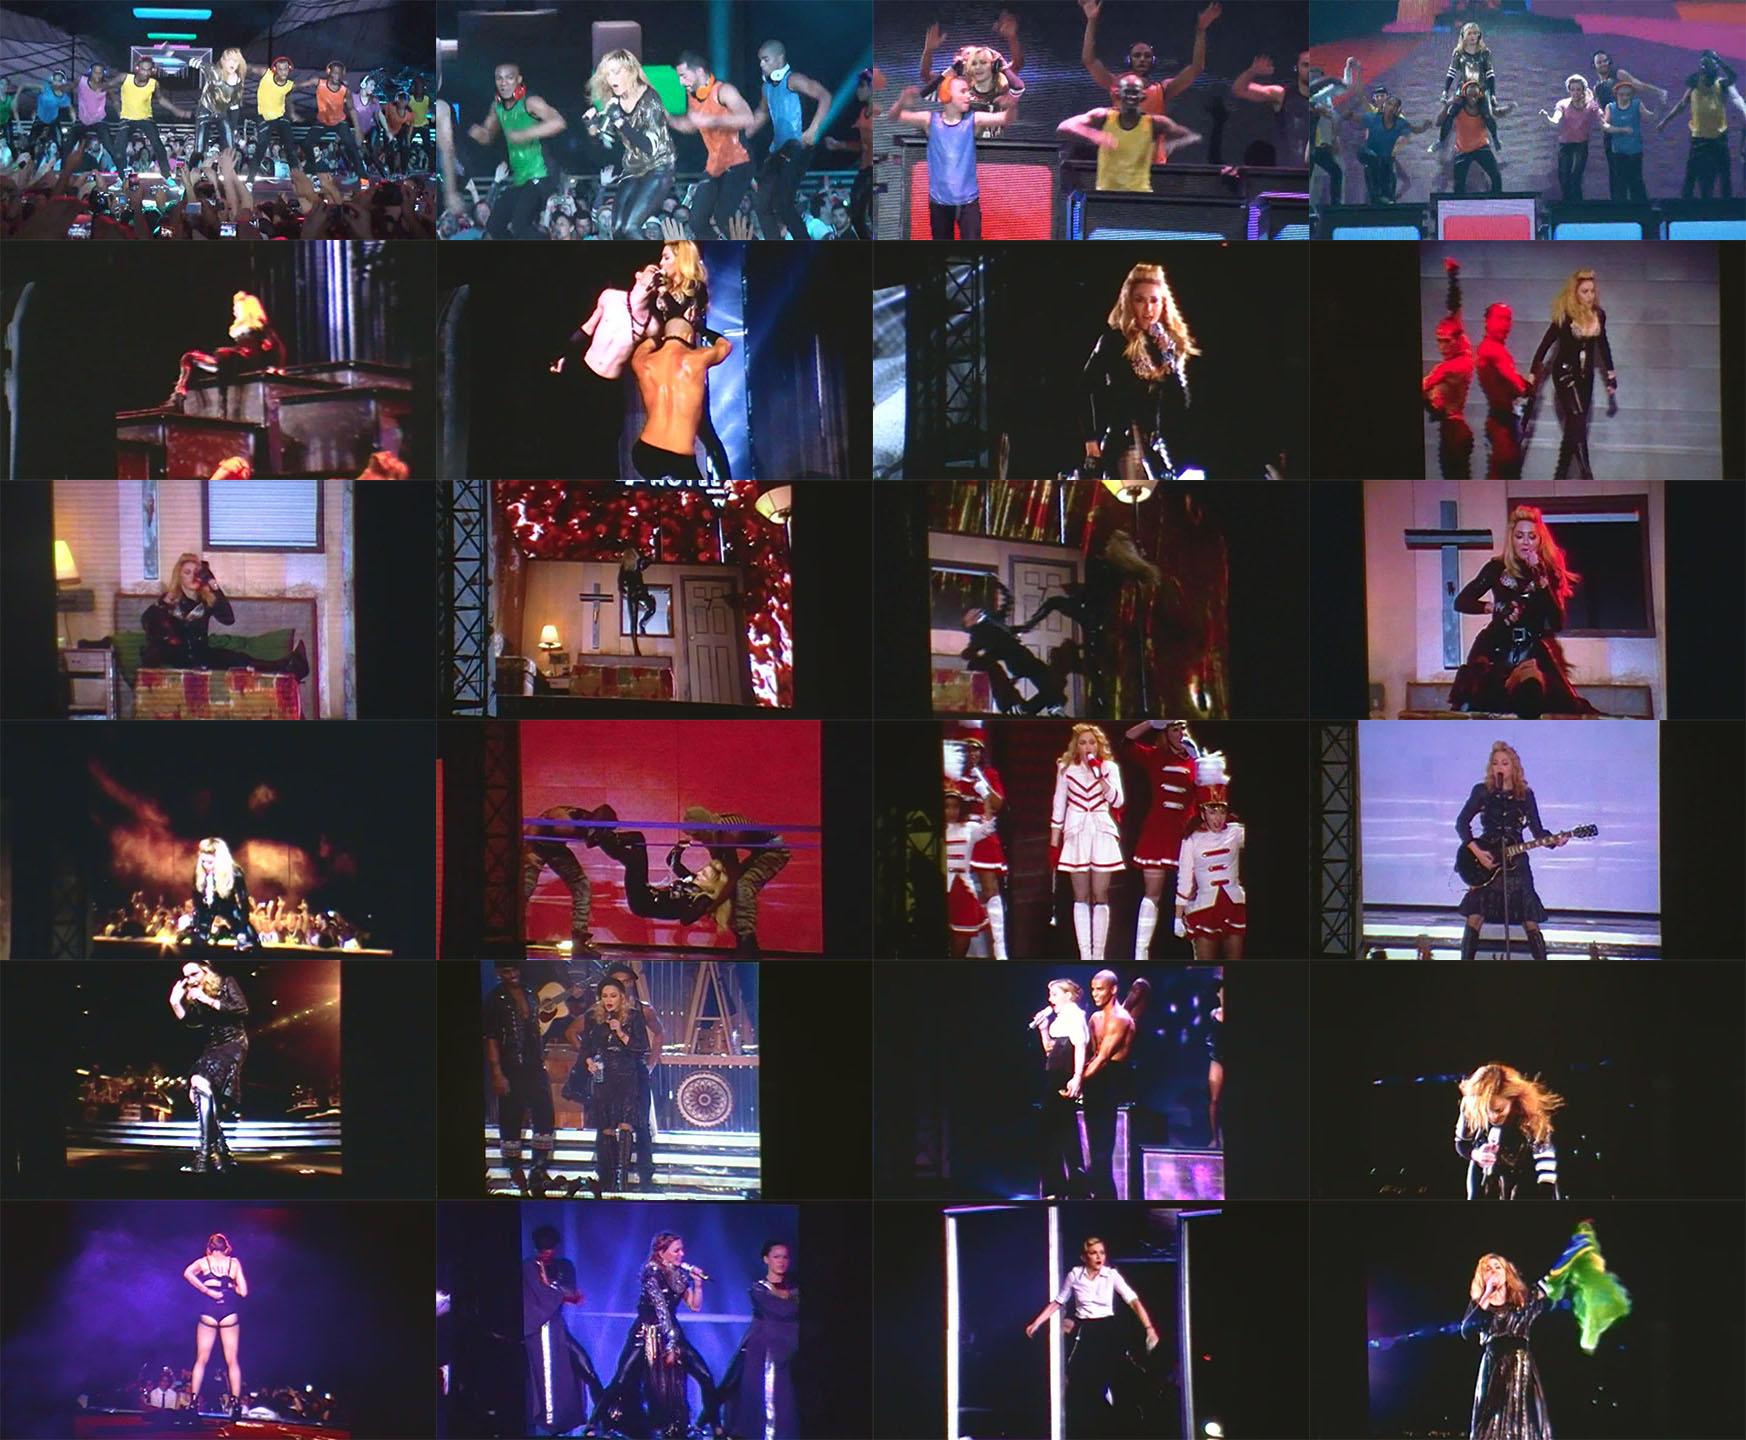 madonna dvd mdna tour são paulo 05.12.2012